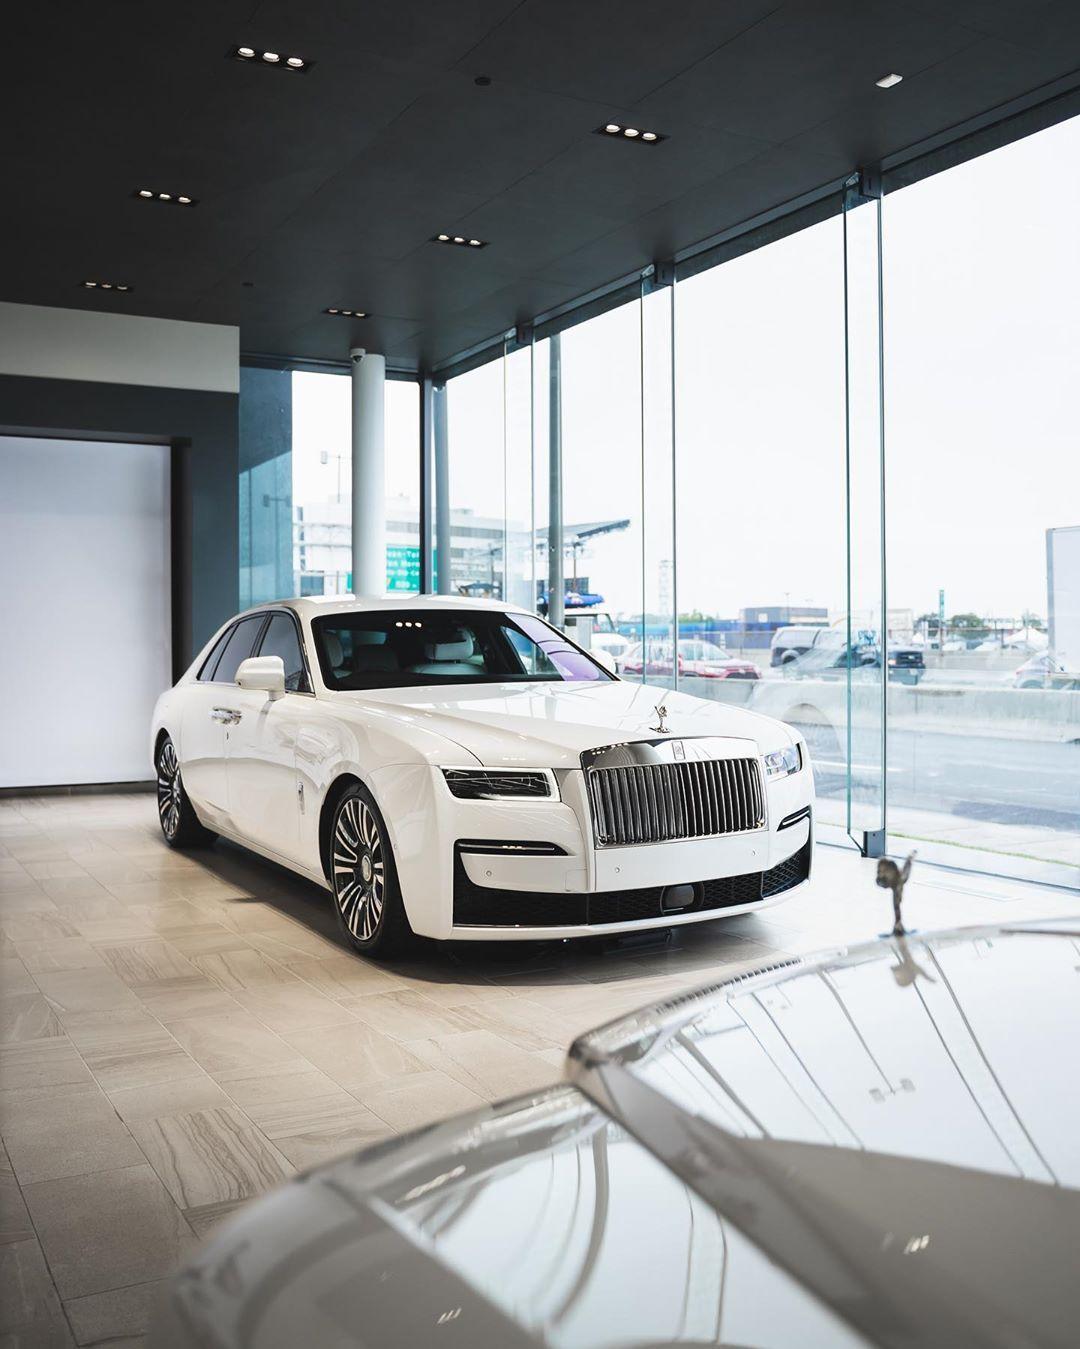 34+ Rolls royce ghost lease background